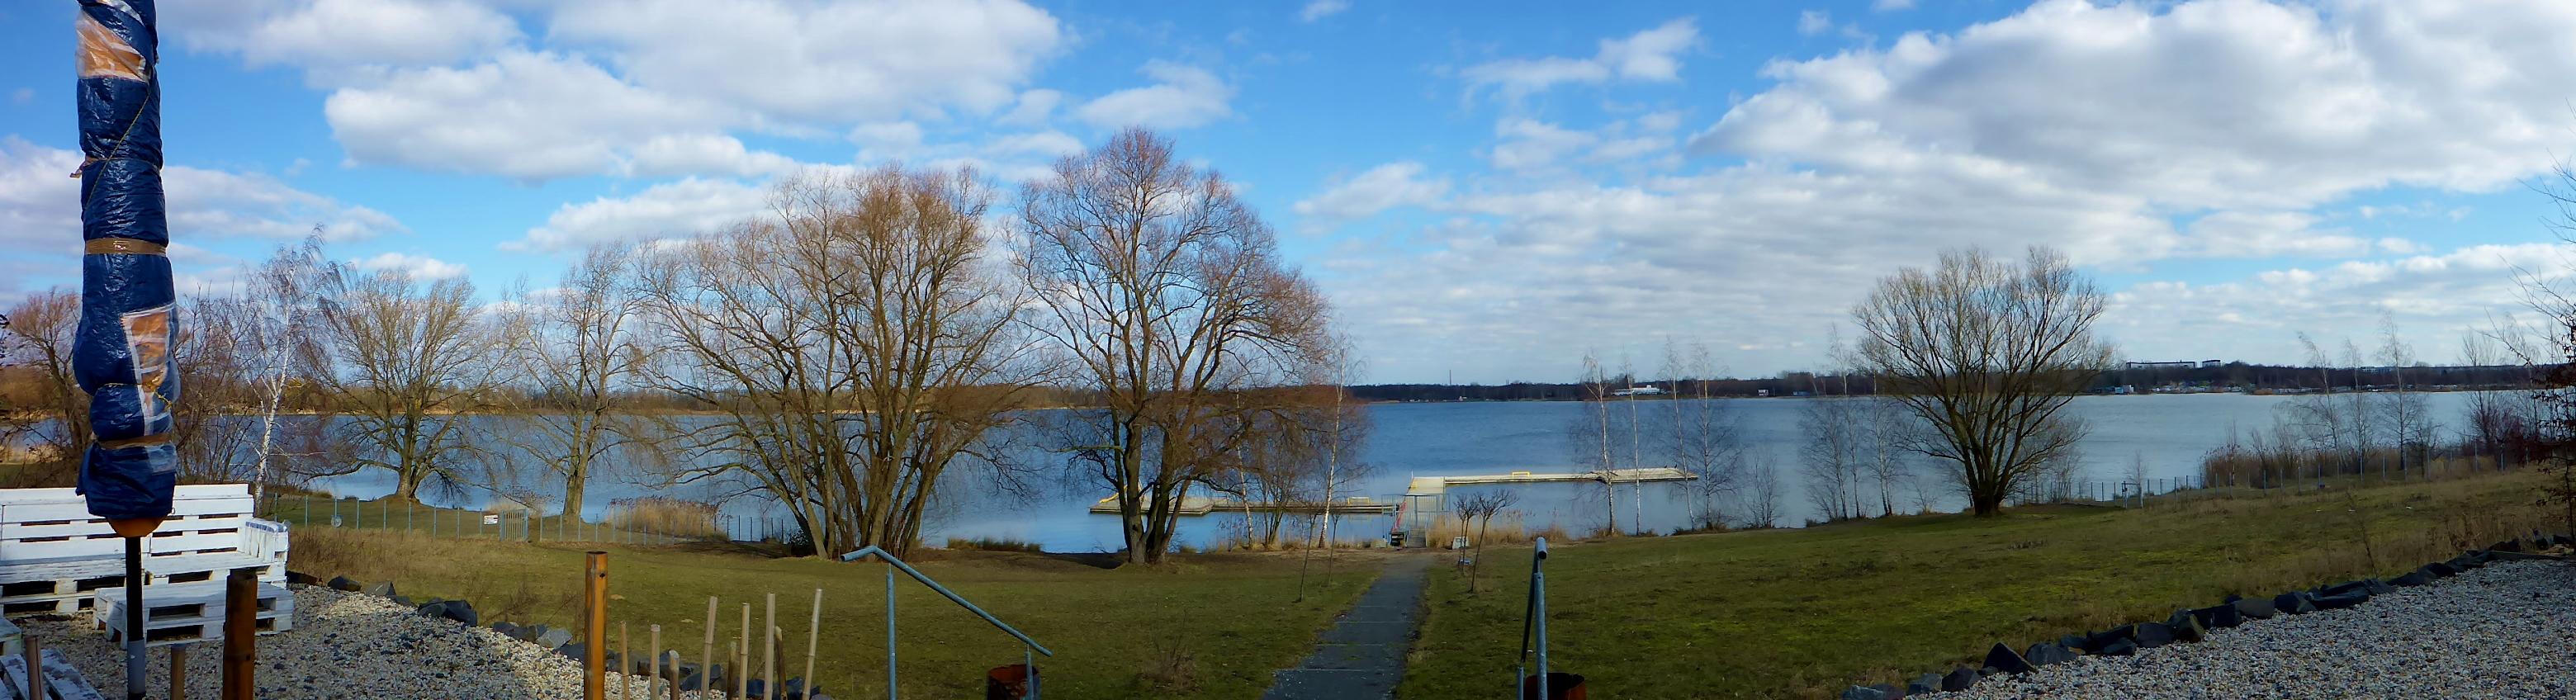 Februar 2017 am Kulkwitzer See